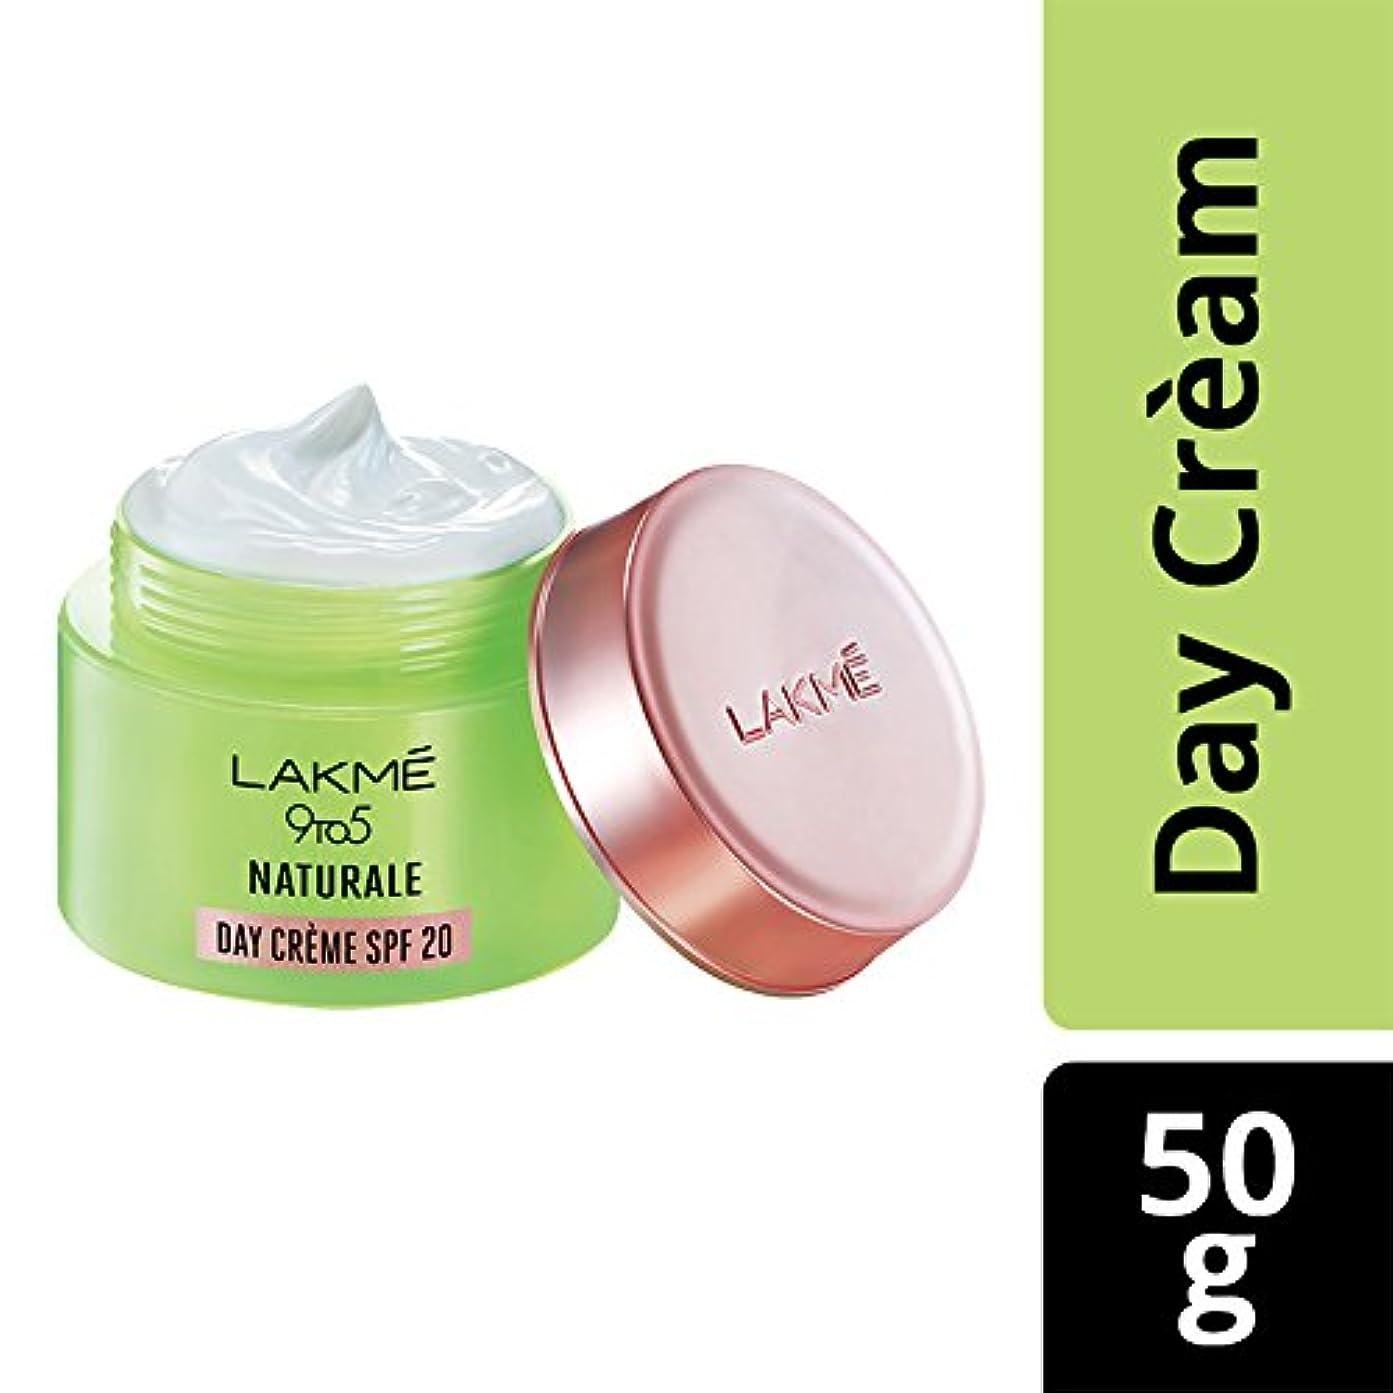 比較女性学習Lakme 9 to 5 Naturale Day Creme SPF 20, 50 g